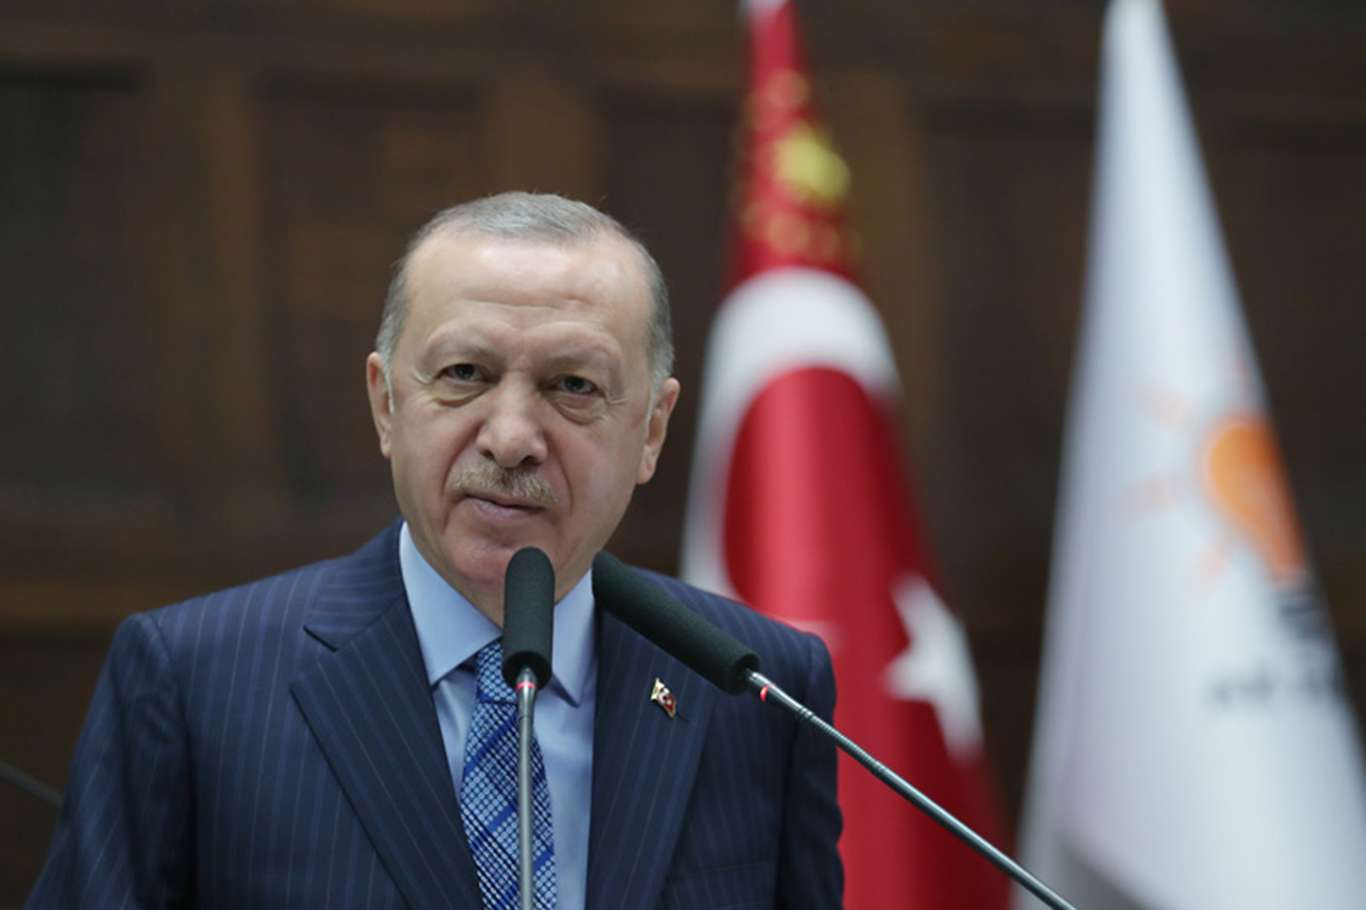 Başkan Erdoğan, CHP'ye Çok Sert Yüklendi